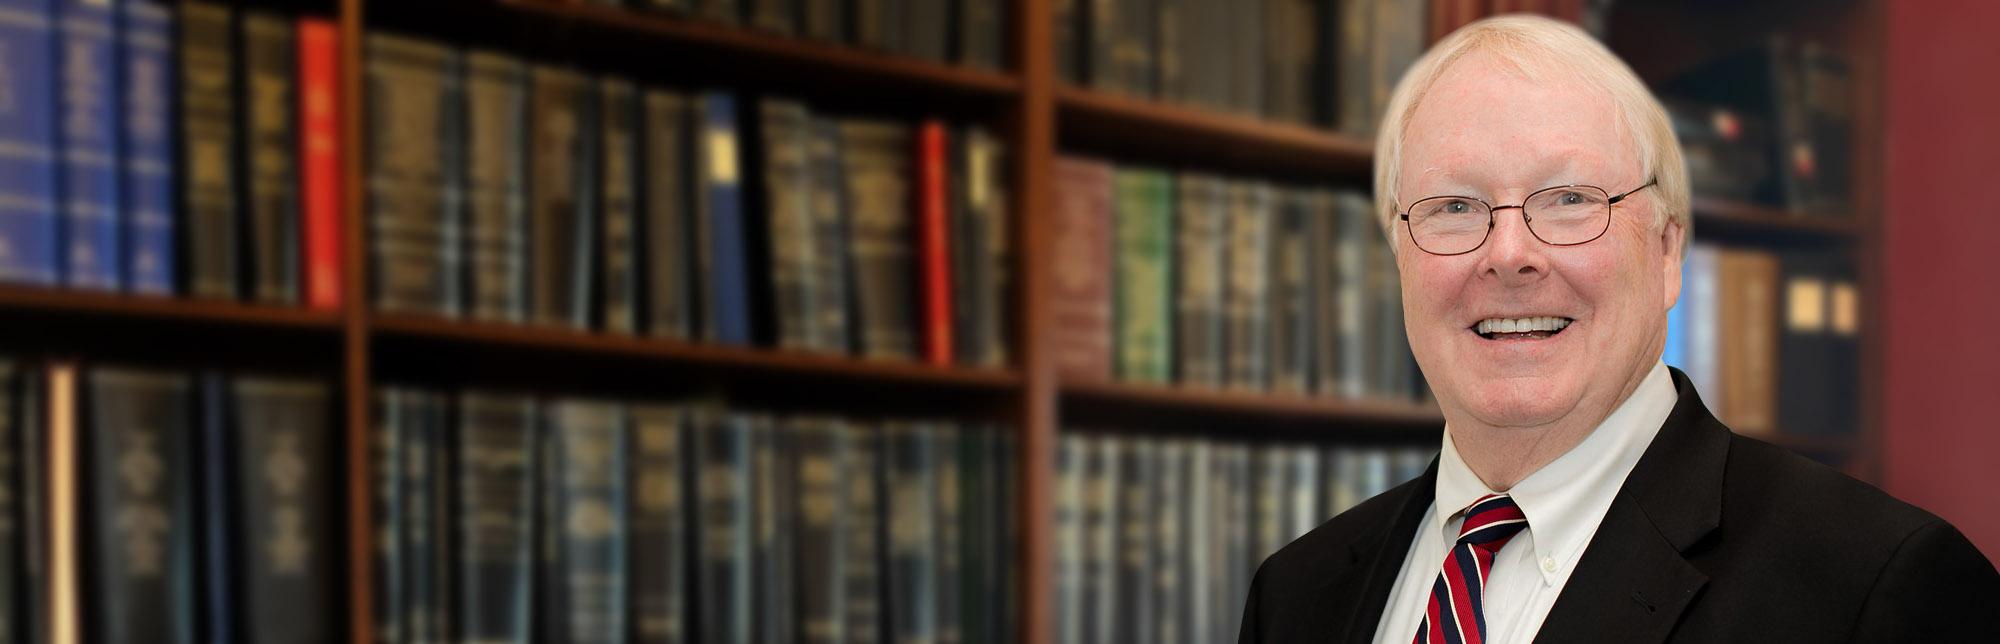 Kip Porter, Executive Vice President of Porter White & Co.